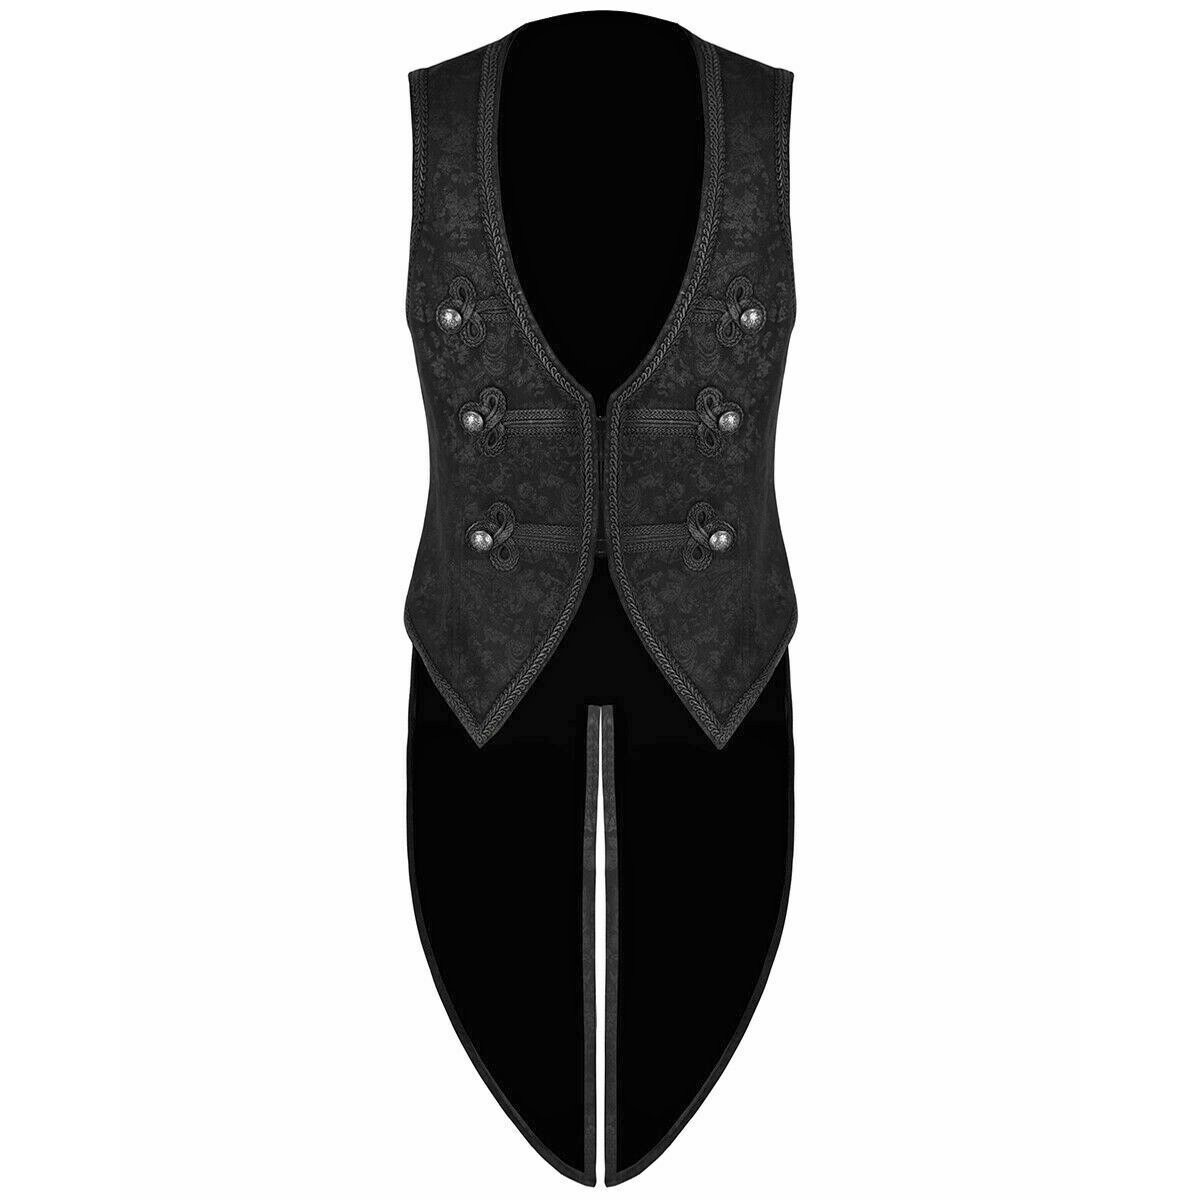 Brocade Vest Waistcoat Tailcoat Black Damask Velvet Gothic Steampunk (2)